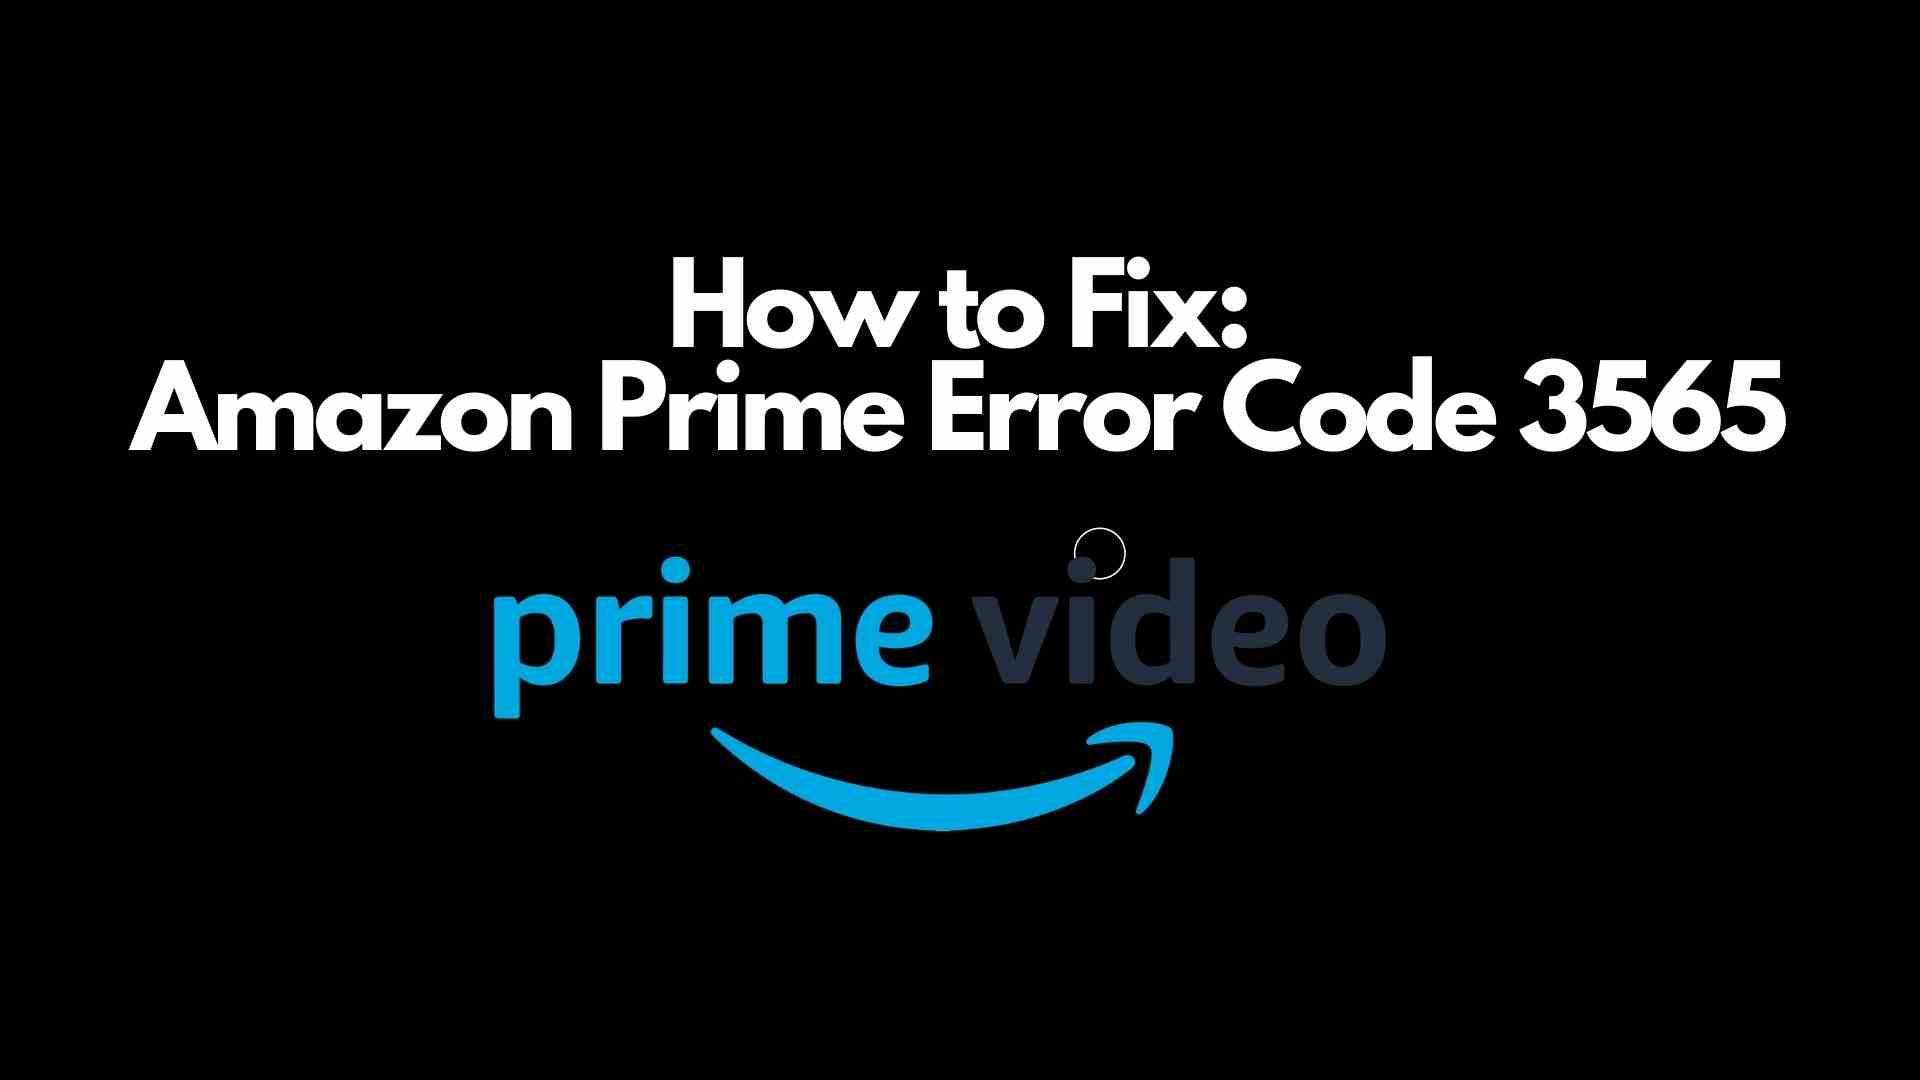 Amazon Prime Error Code 3565 fix